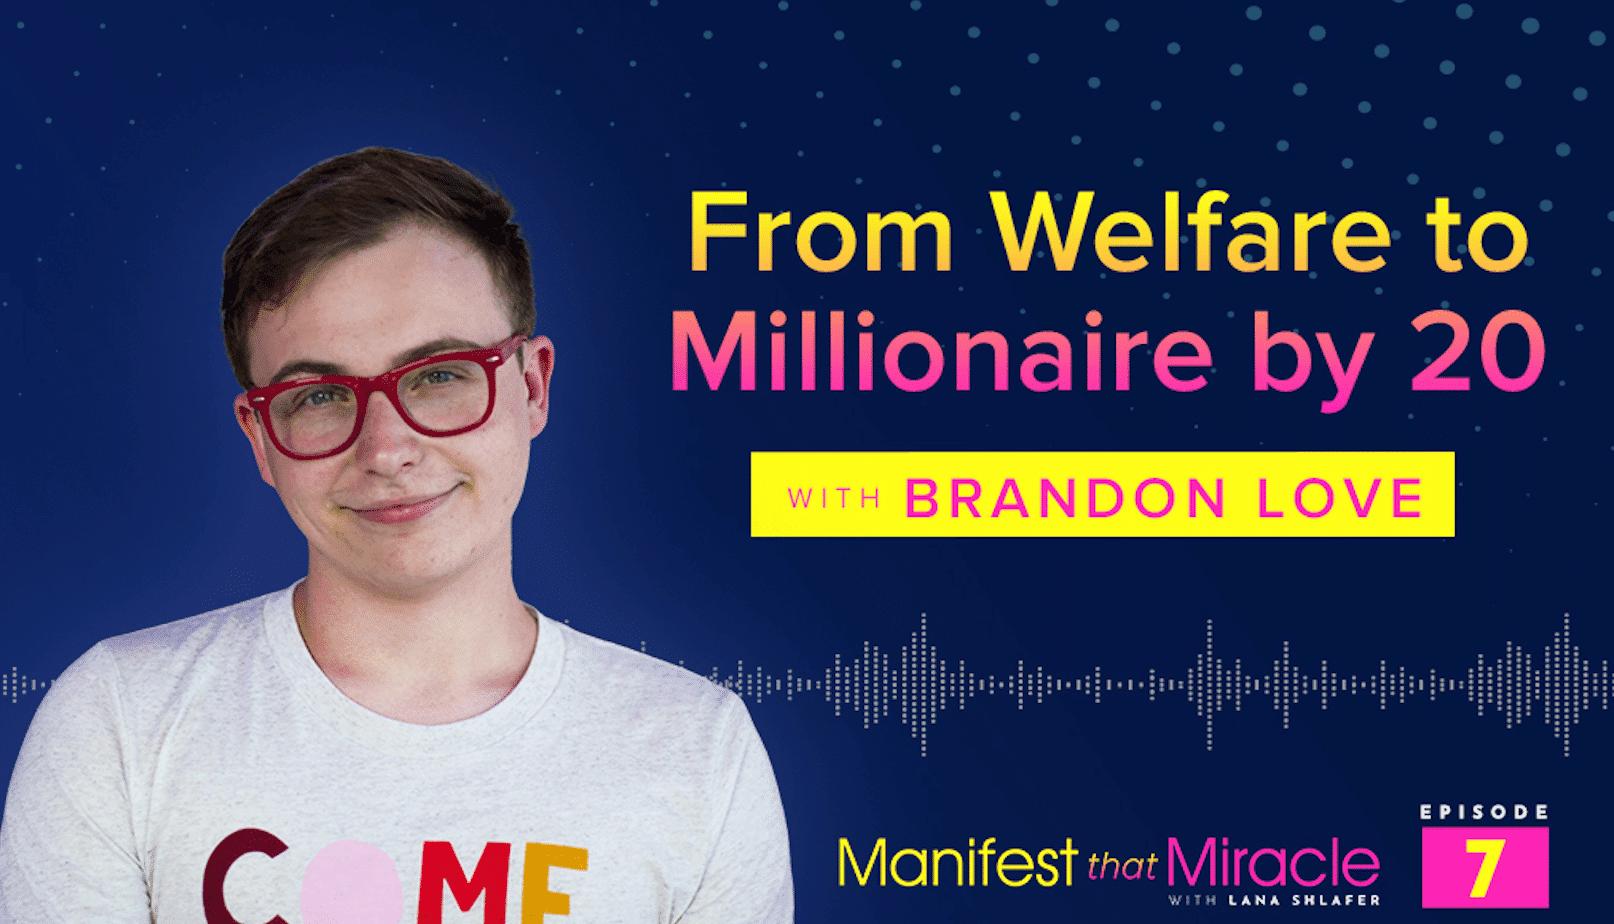 Brandon Love: Welfare to Millionaire by 20